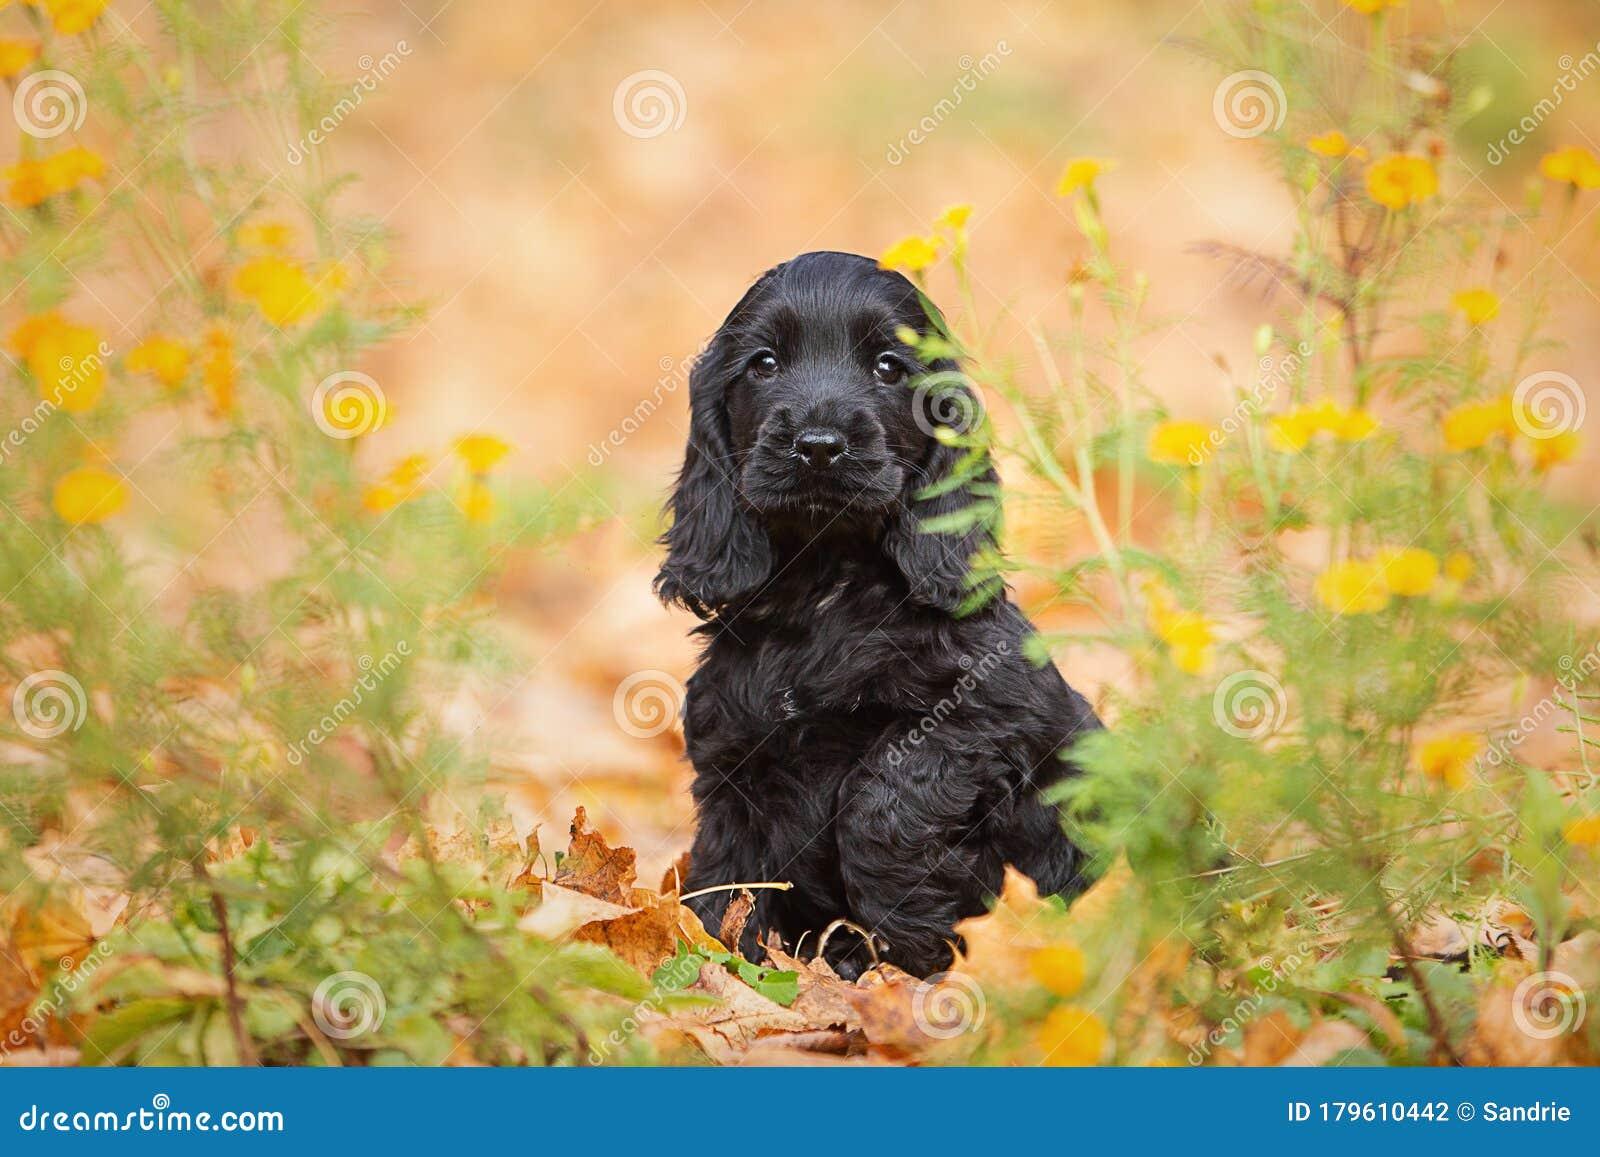 A Black English Cocker Spaniel Puppy Stock Photo Image Of Foliage Animal 179610442